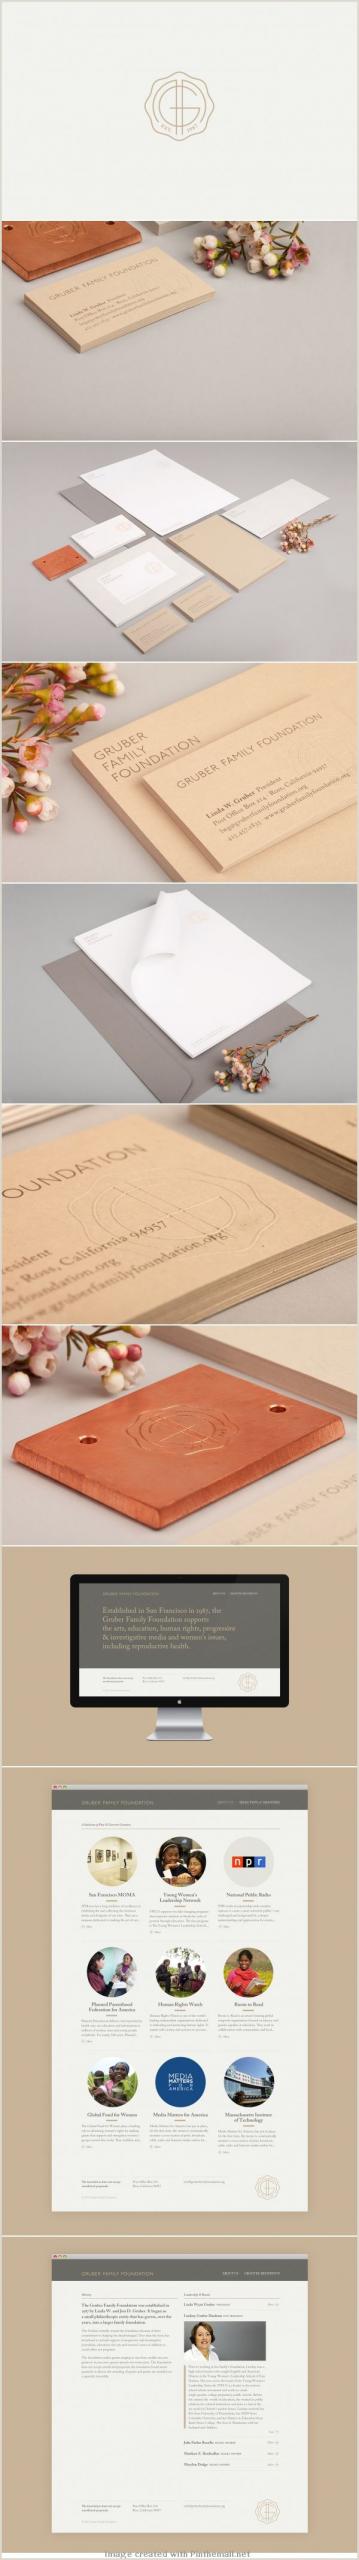 Design Your Own Business Cards 14 Popular Hardwood Flooring Business Card Template